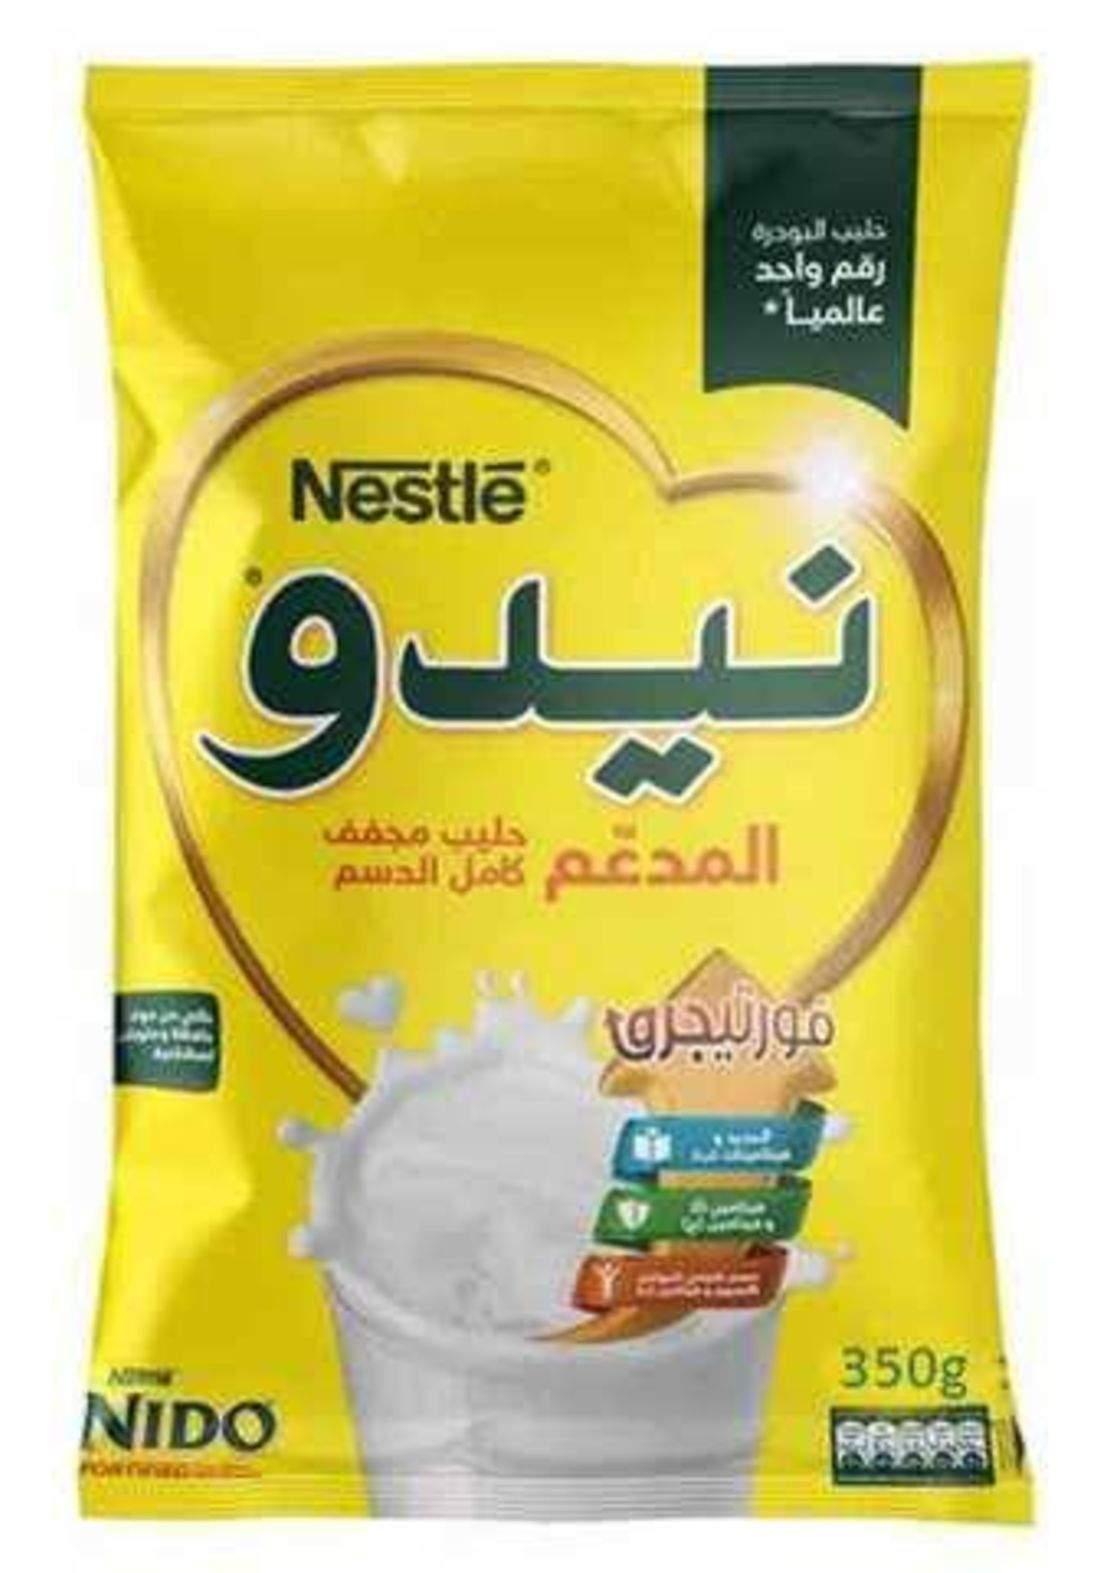 Nido milk powder 350g نيدو حليب مجفف